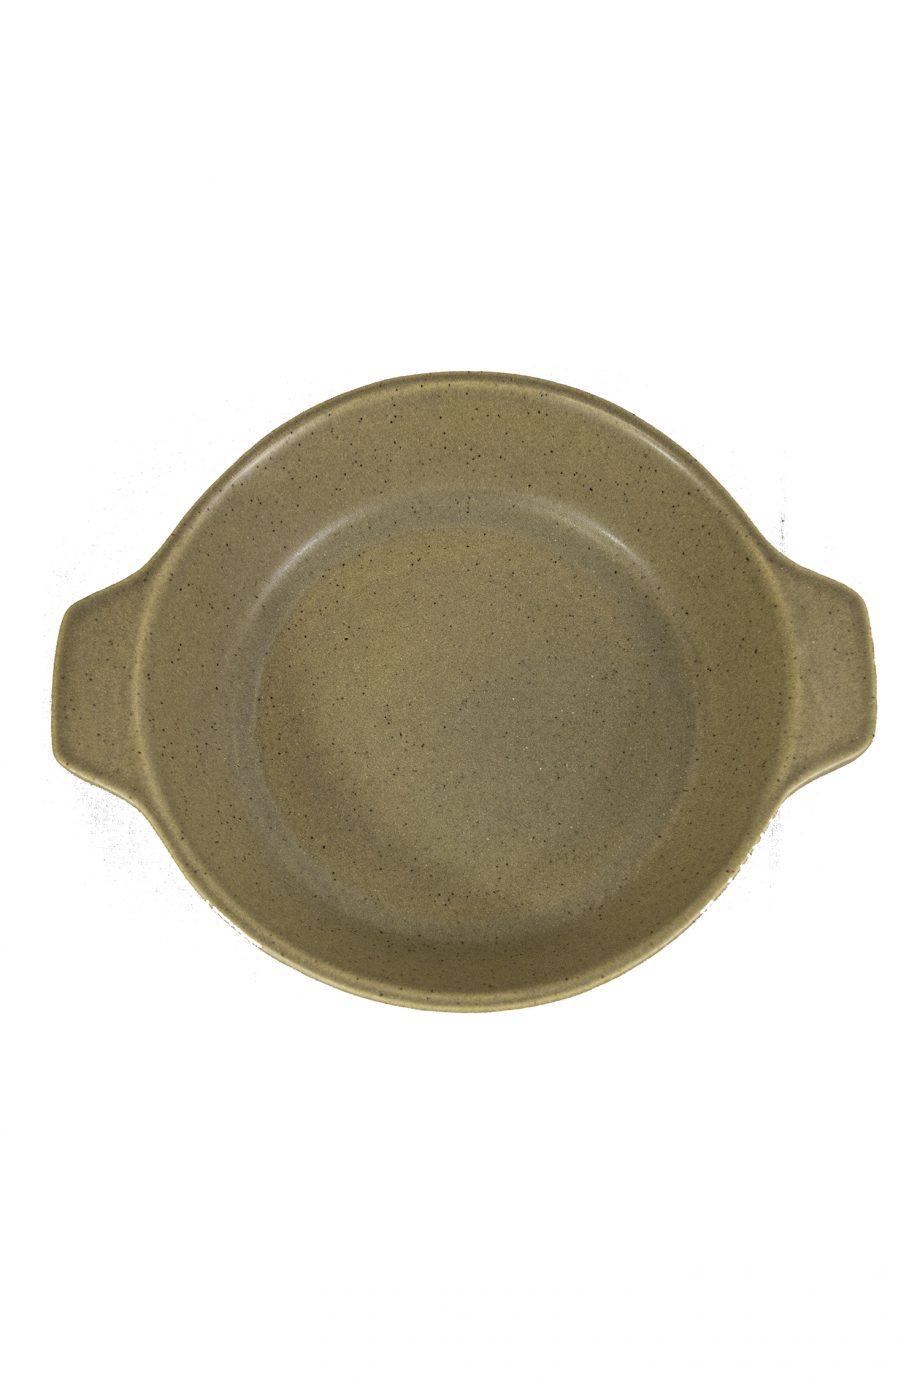 oven bord mosterd mat ceramic aardewerk large